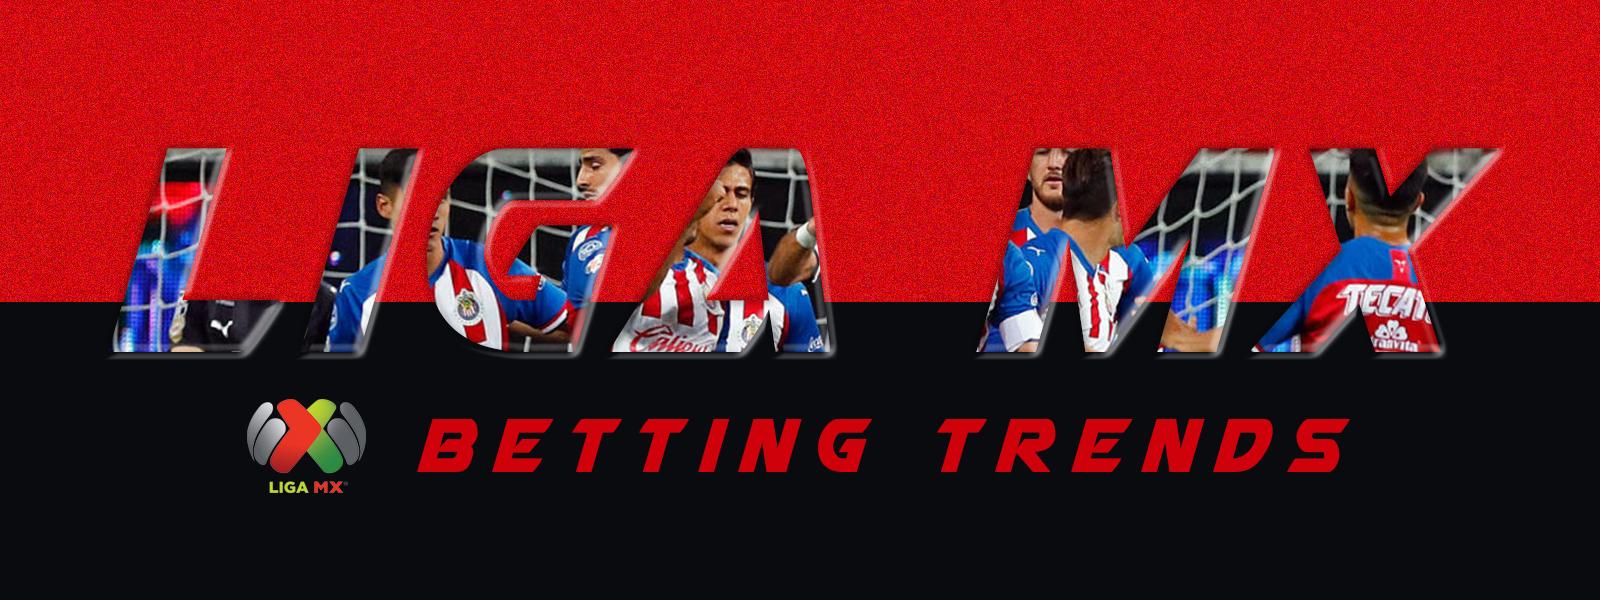 Mexican Football League - Liga MX 2020-21 Betting Trends